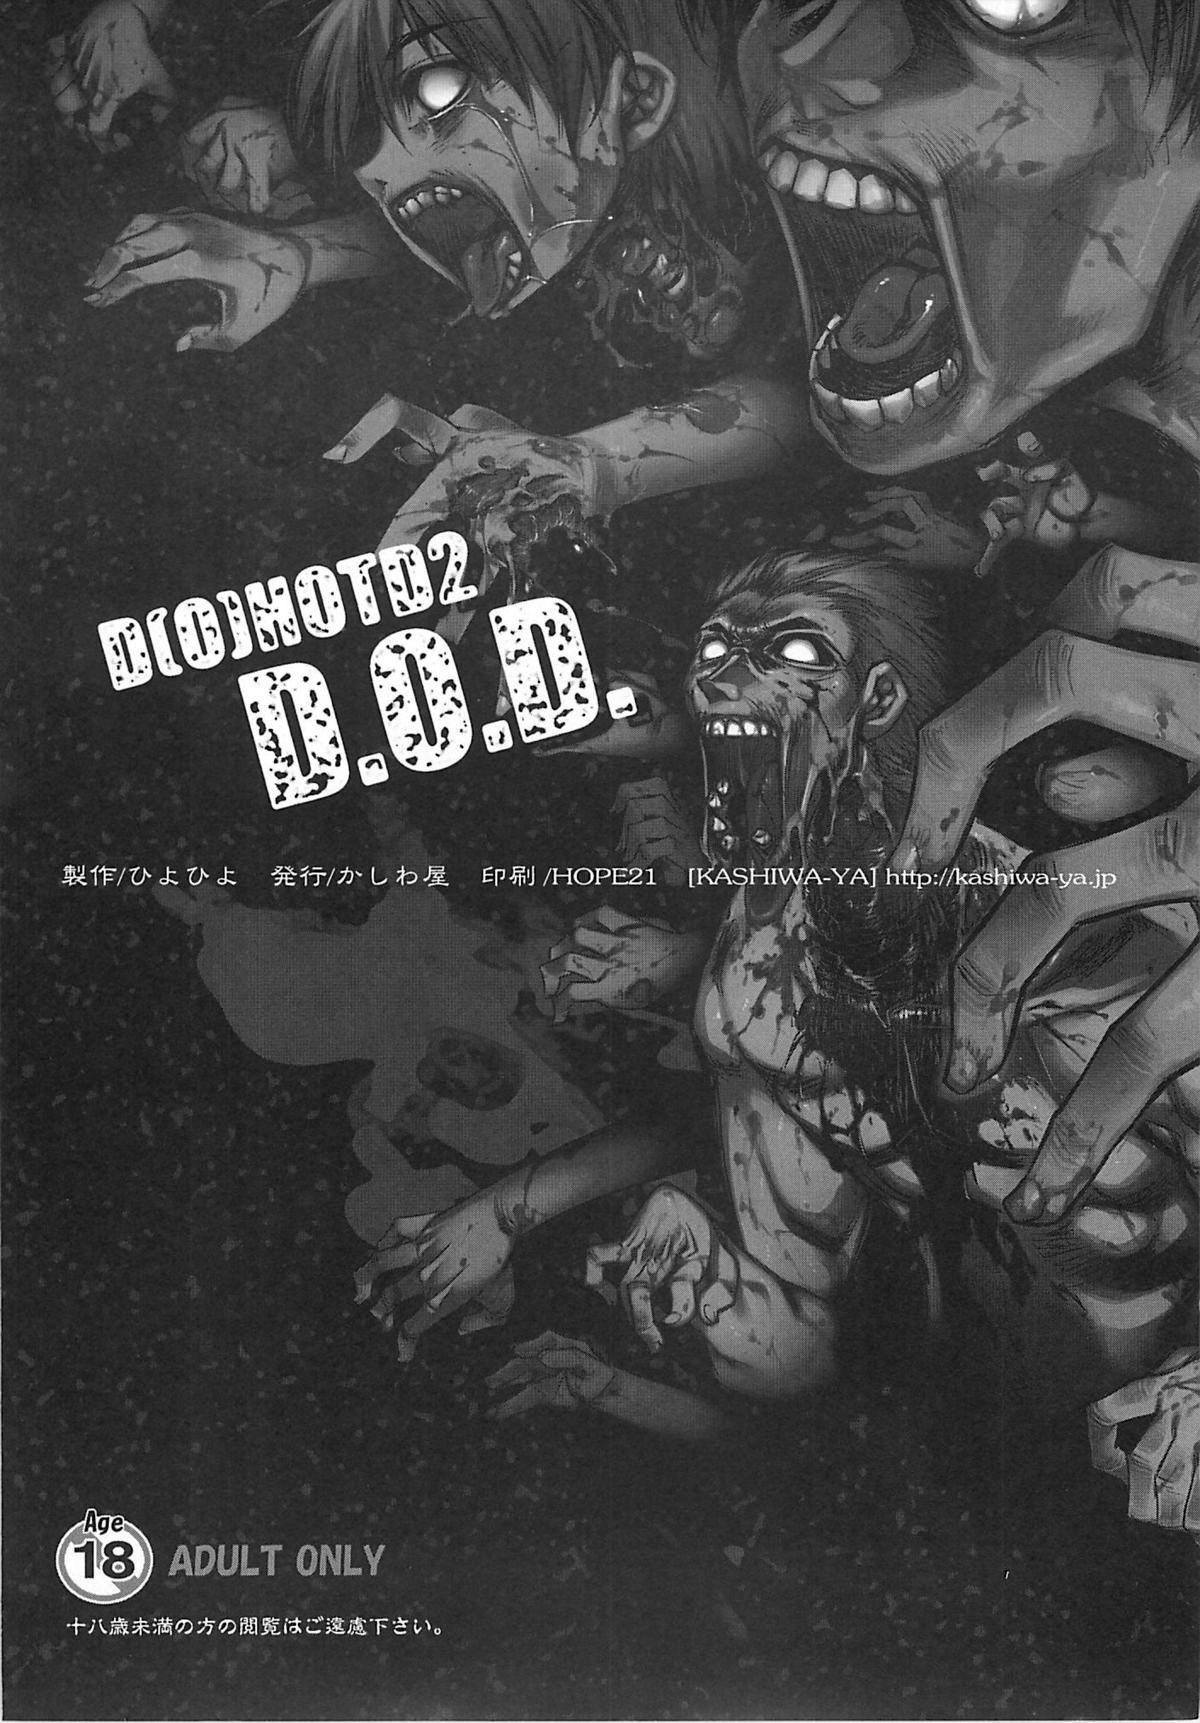 (C74) [Kashiwa-ya (Hiyo Hiyo)] D[O]HOTD2 D.O.D. (Gakuen Mokushiroku HIGHSCHOOL OF THE DEAD) [English] [Nicchi + 4dawgs] 17